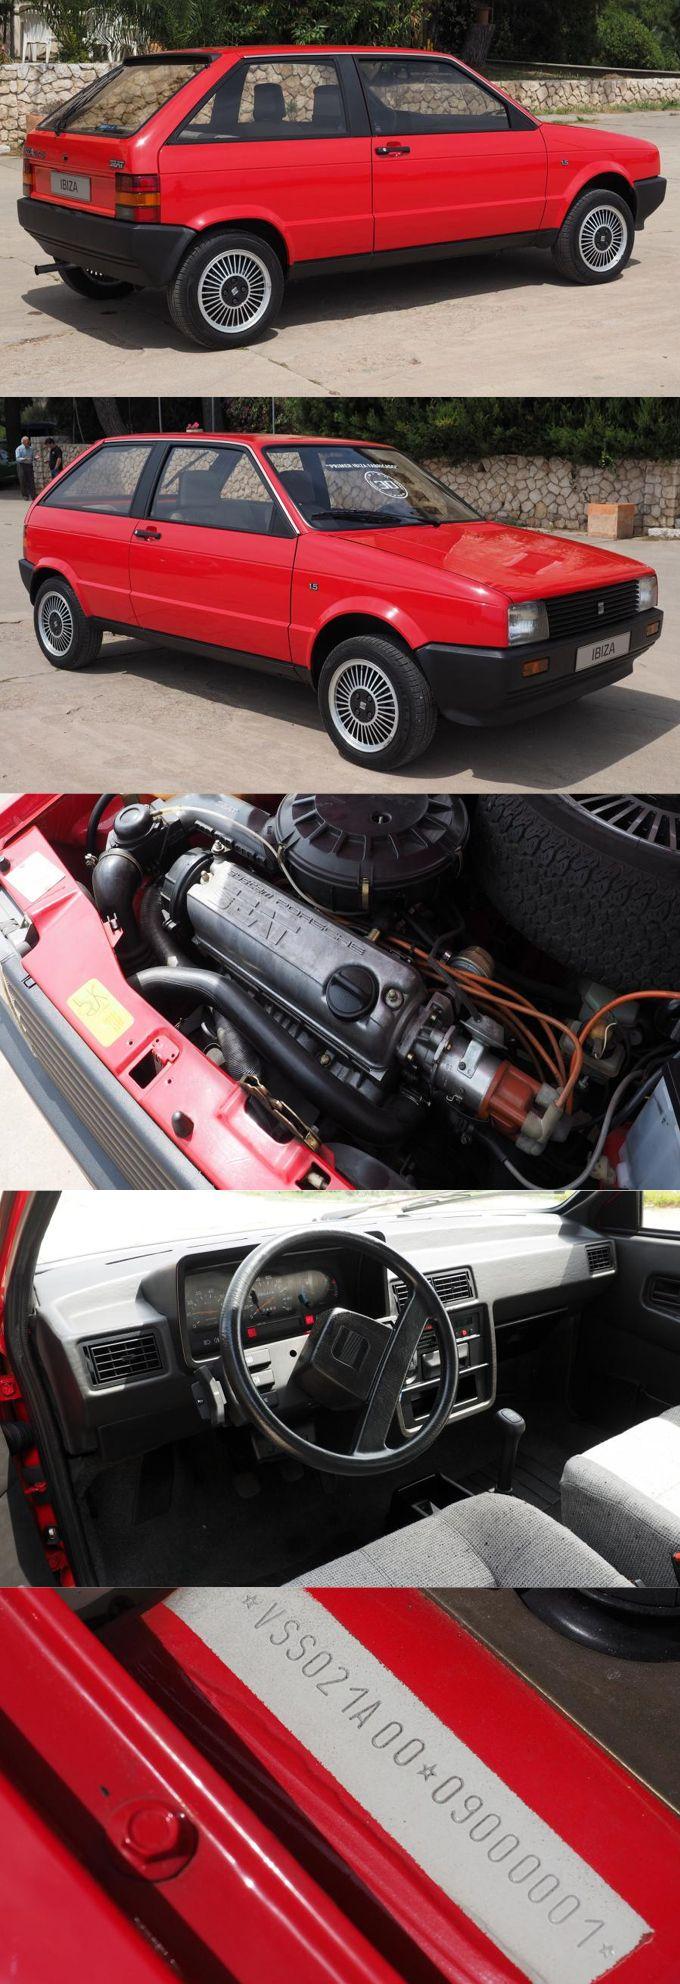 1988 Seat Ibiza / first one produced / Giorgietto Giugiaro / System Porsche / Spain / red